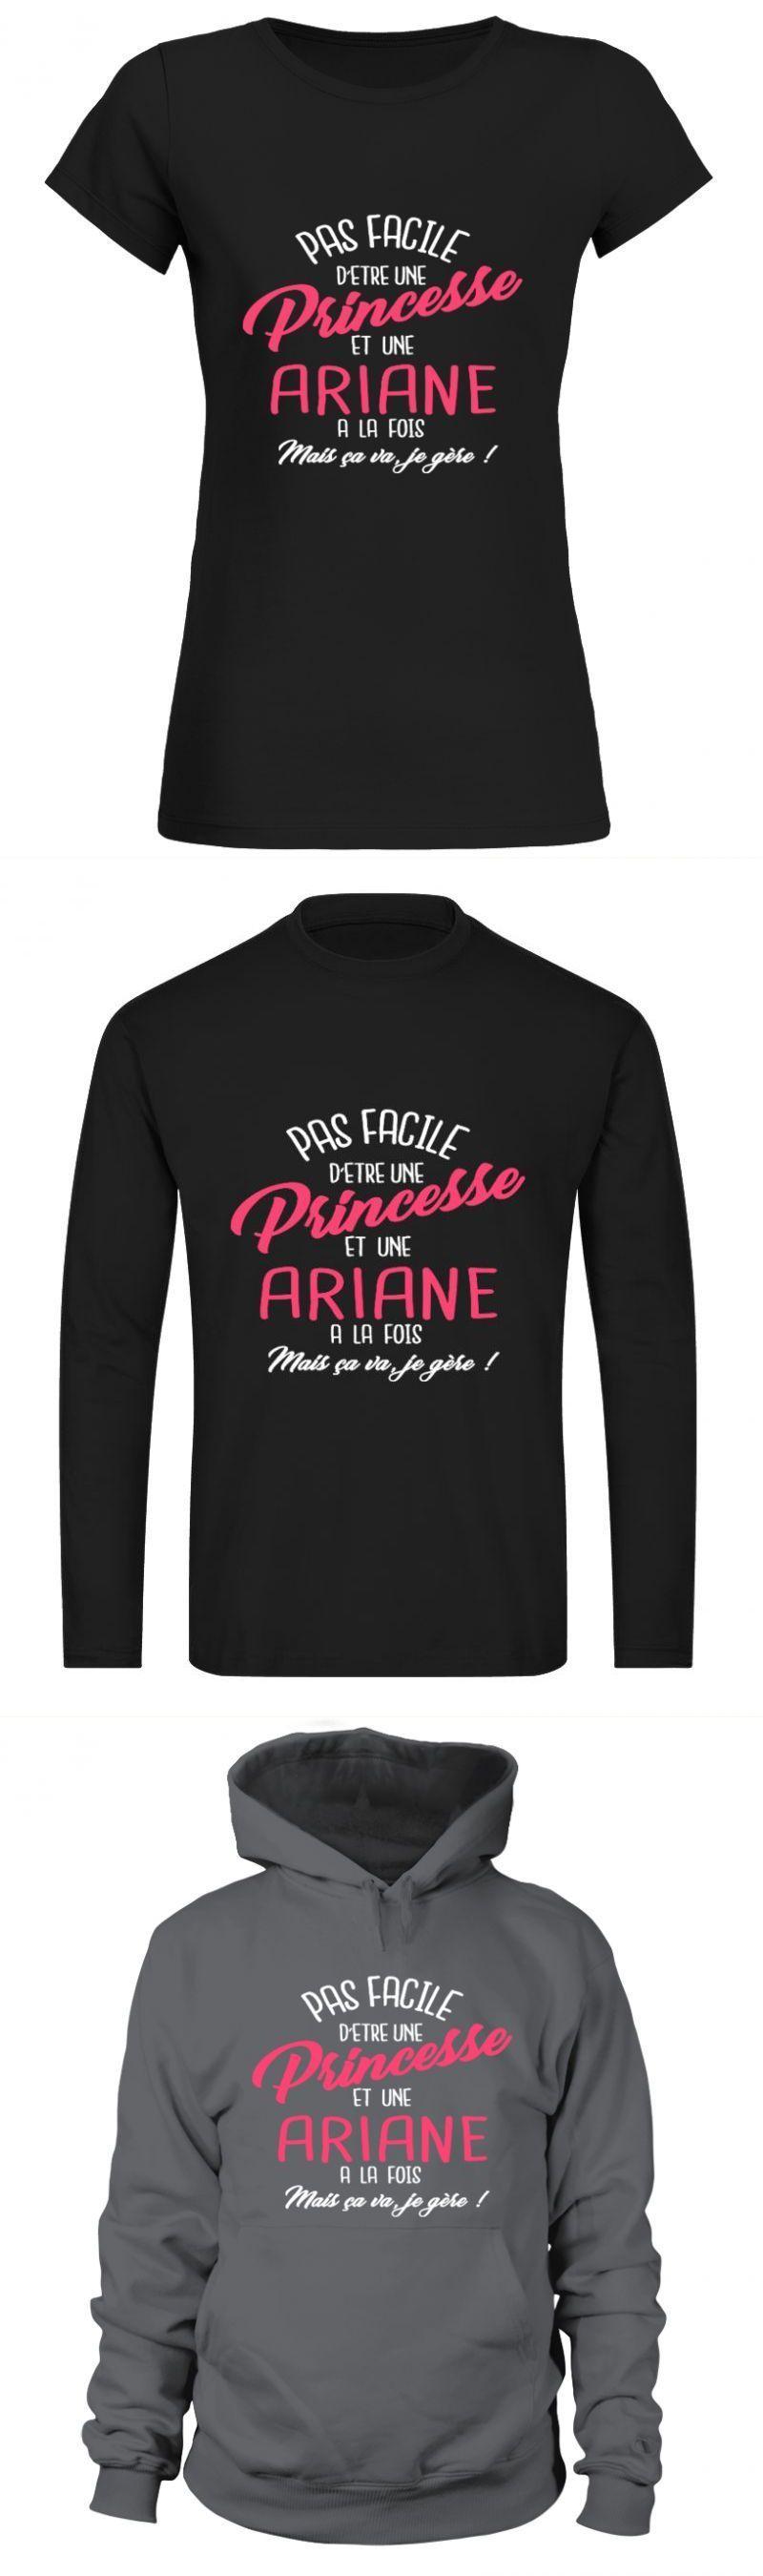 Ariane ts Home